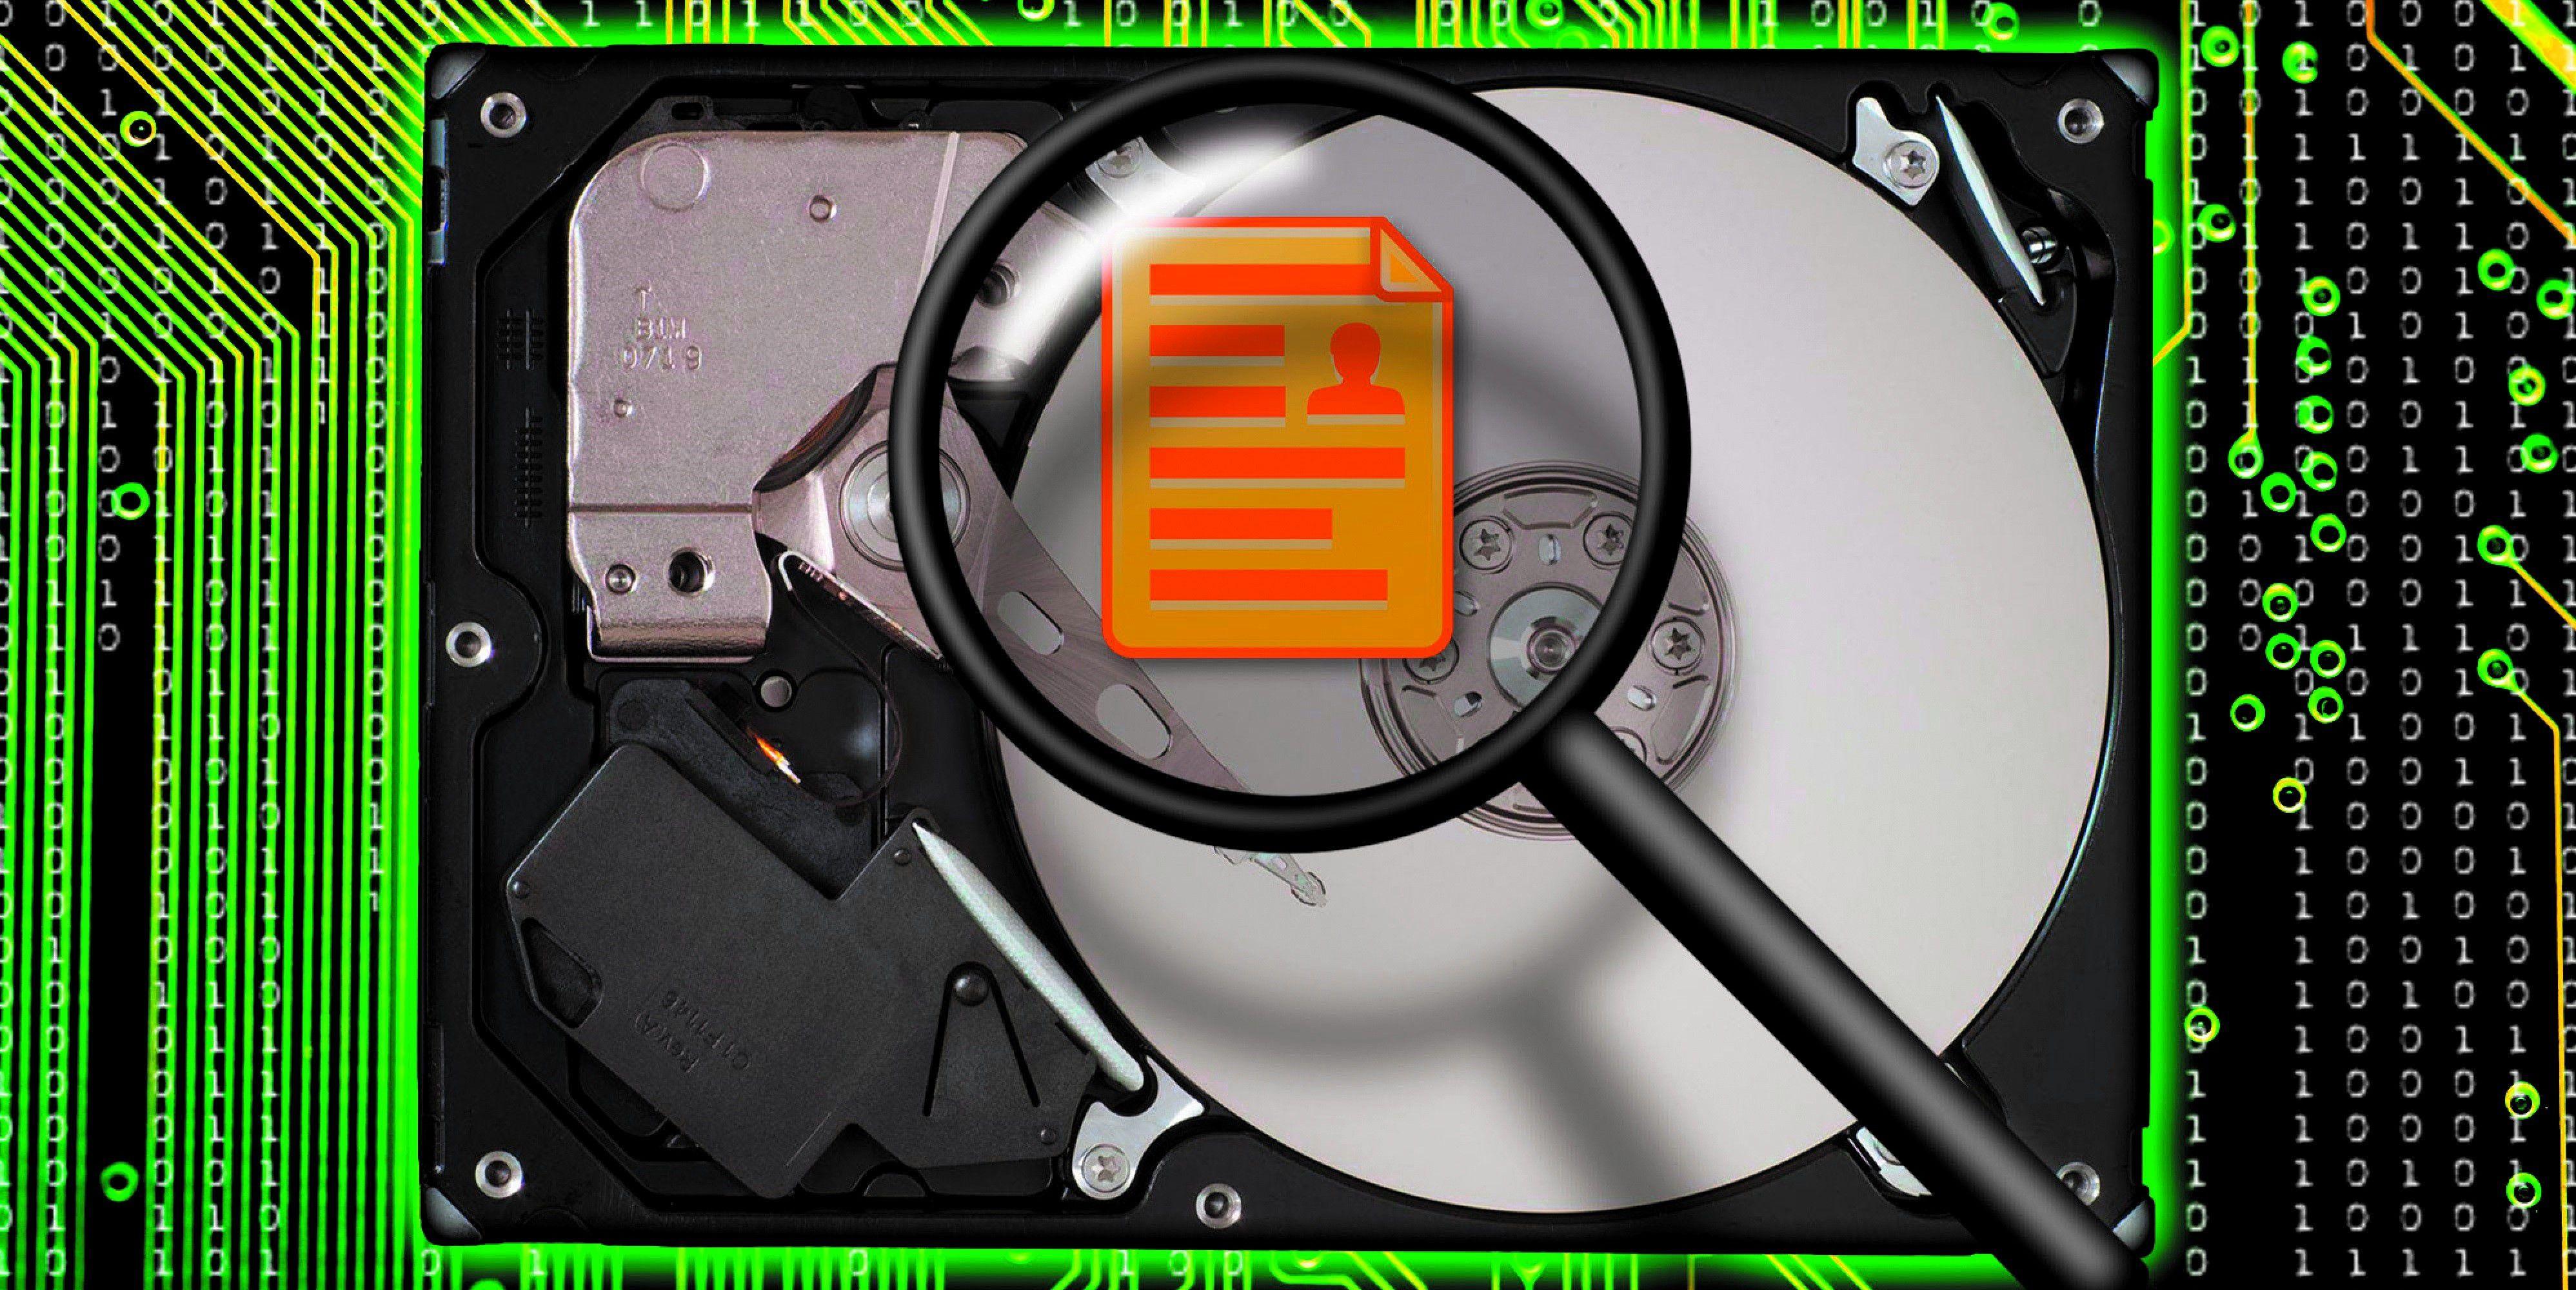 Festplatte Defekt Datenrettung Wie Die Profis Pc Welt